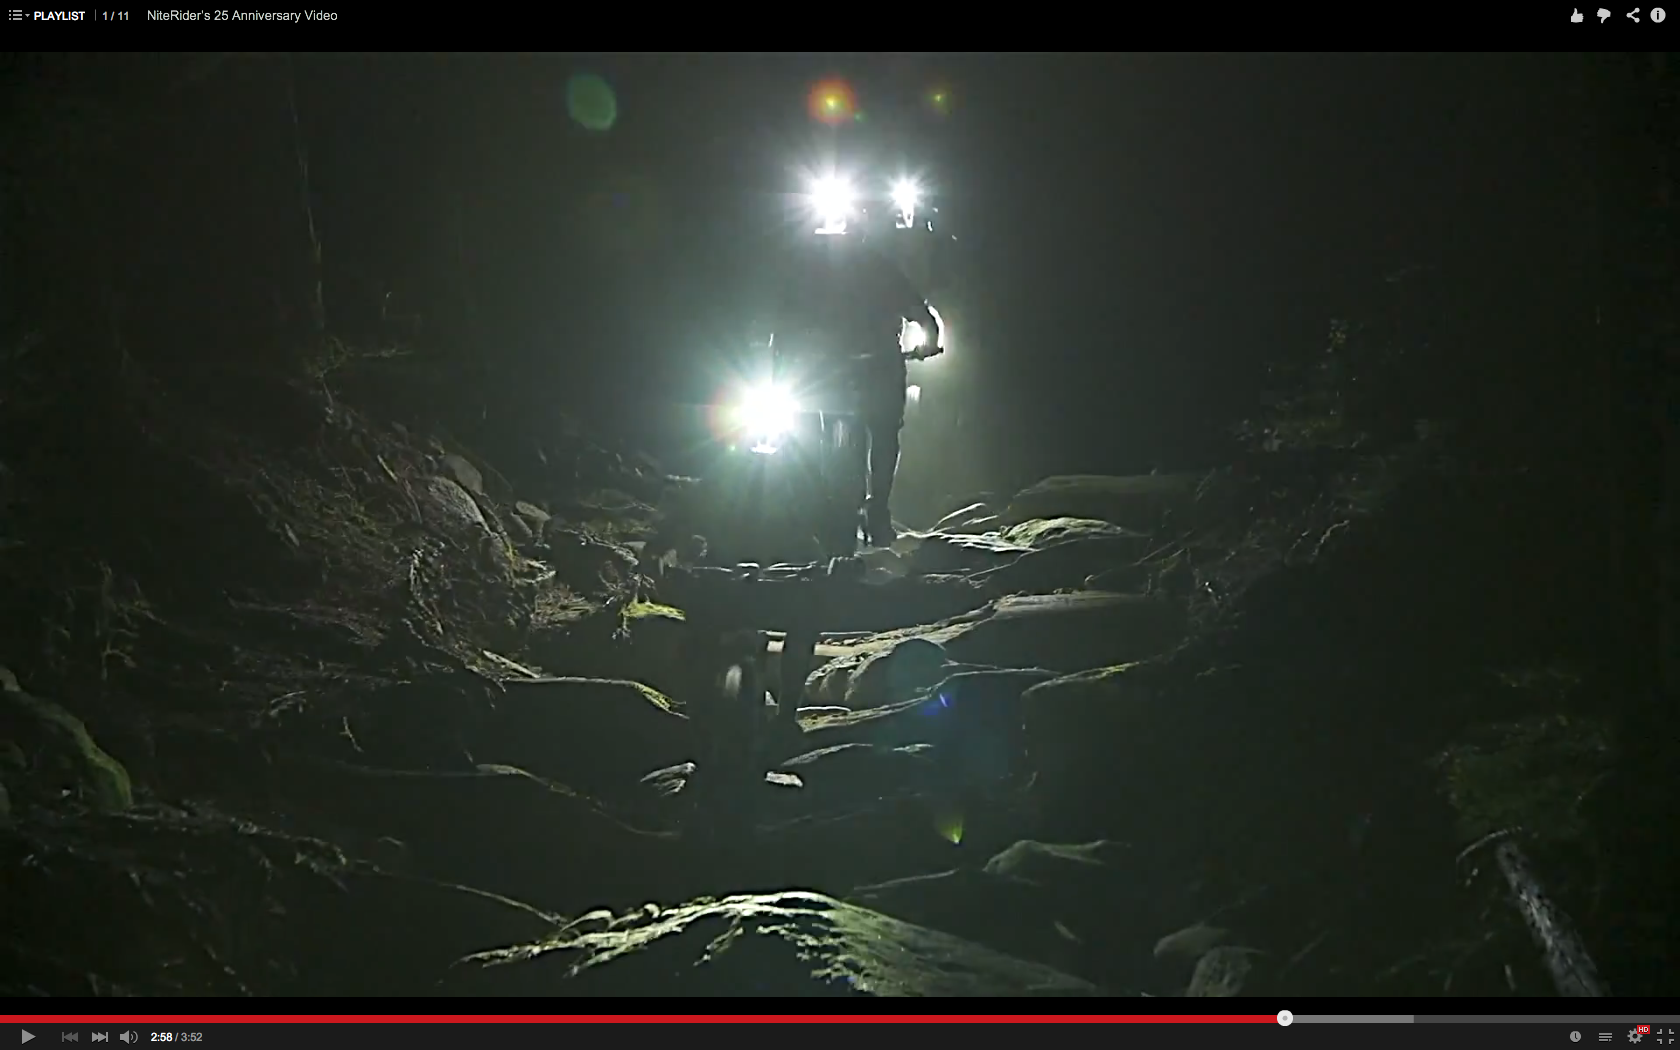 2014-10-15 niterider video